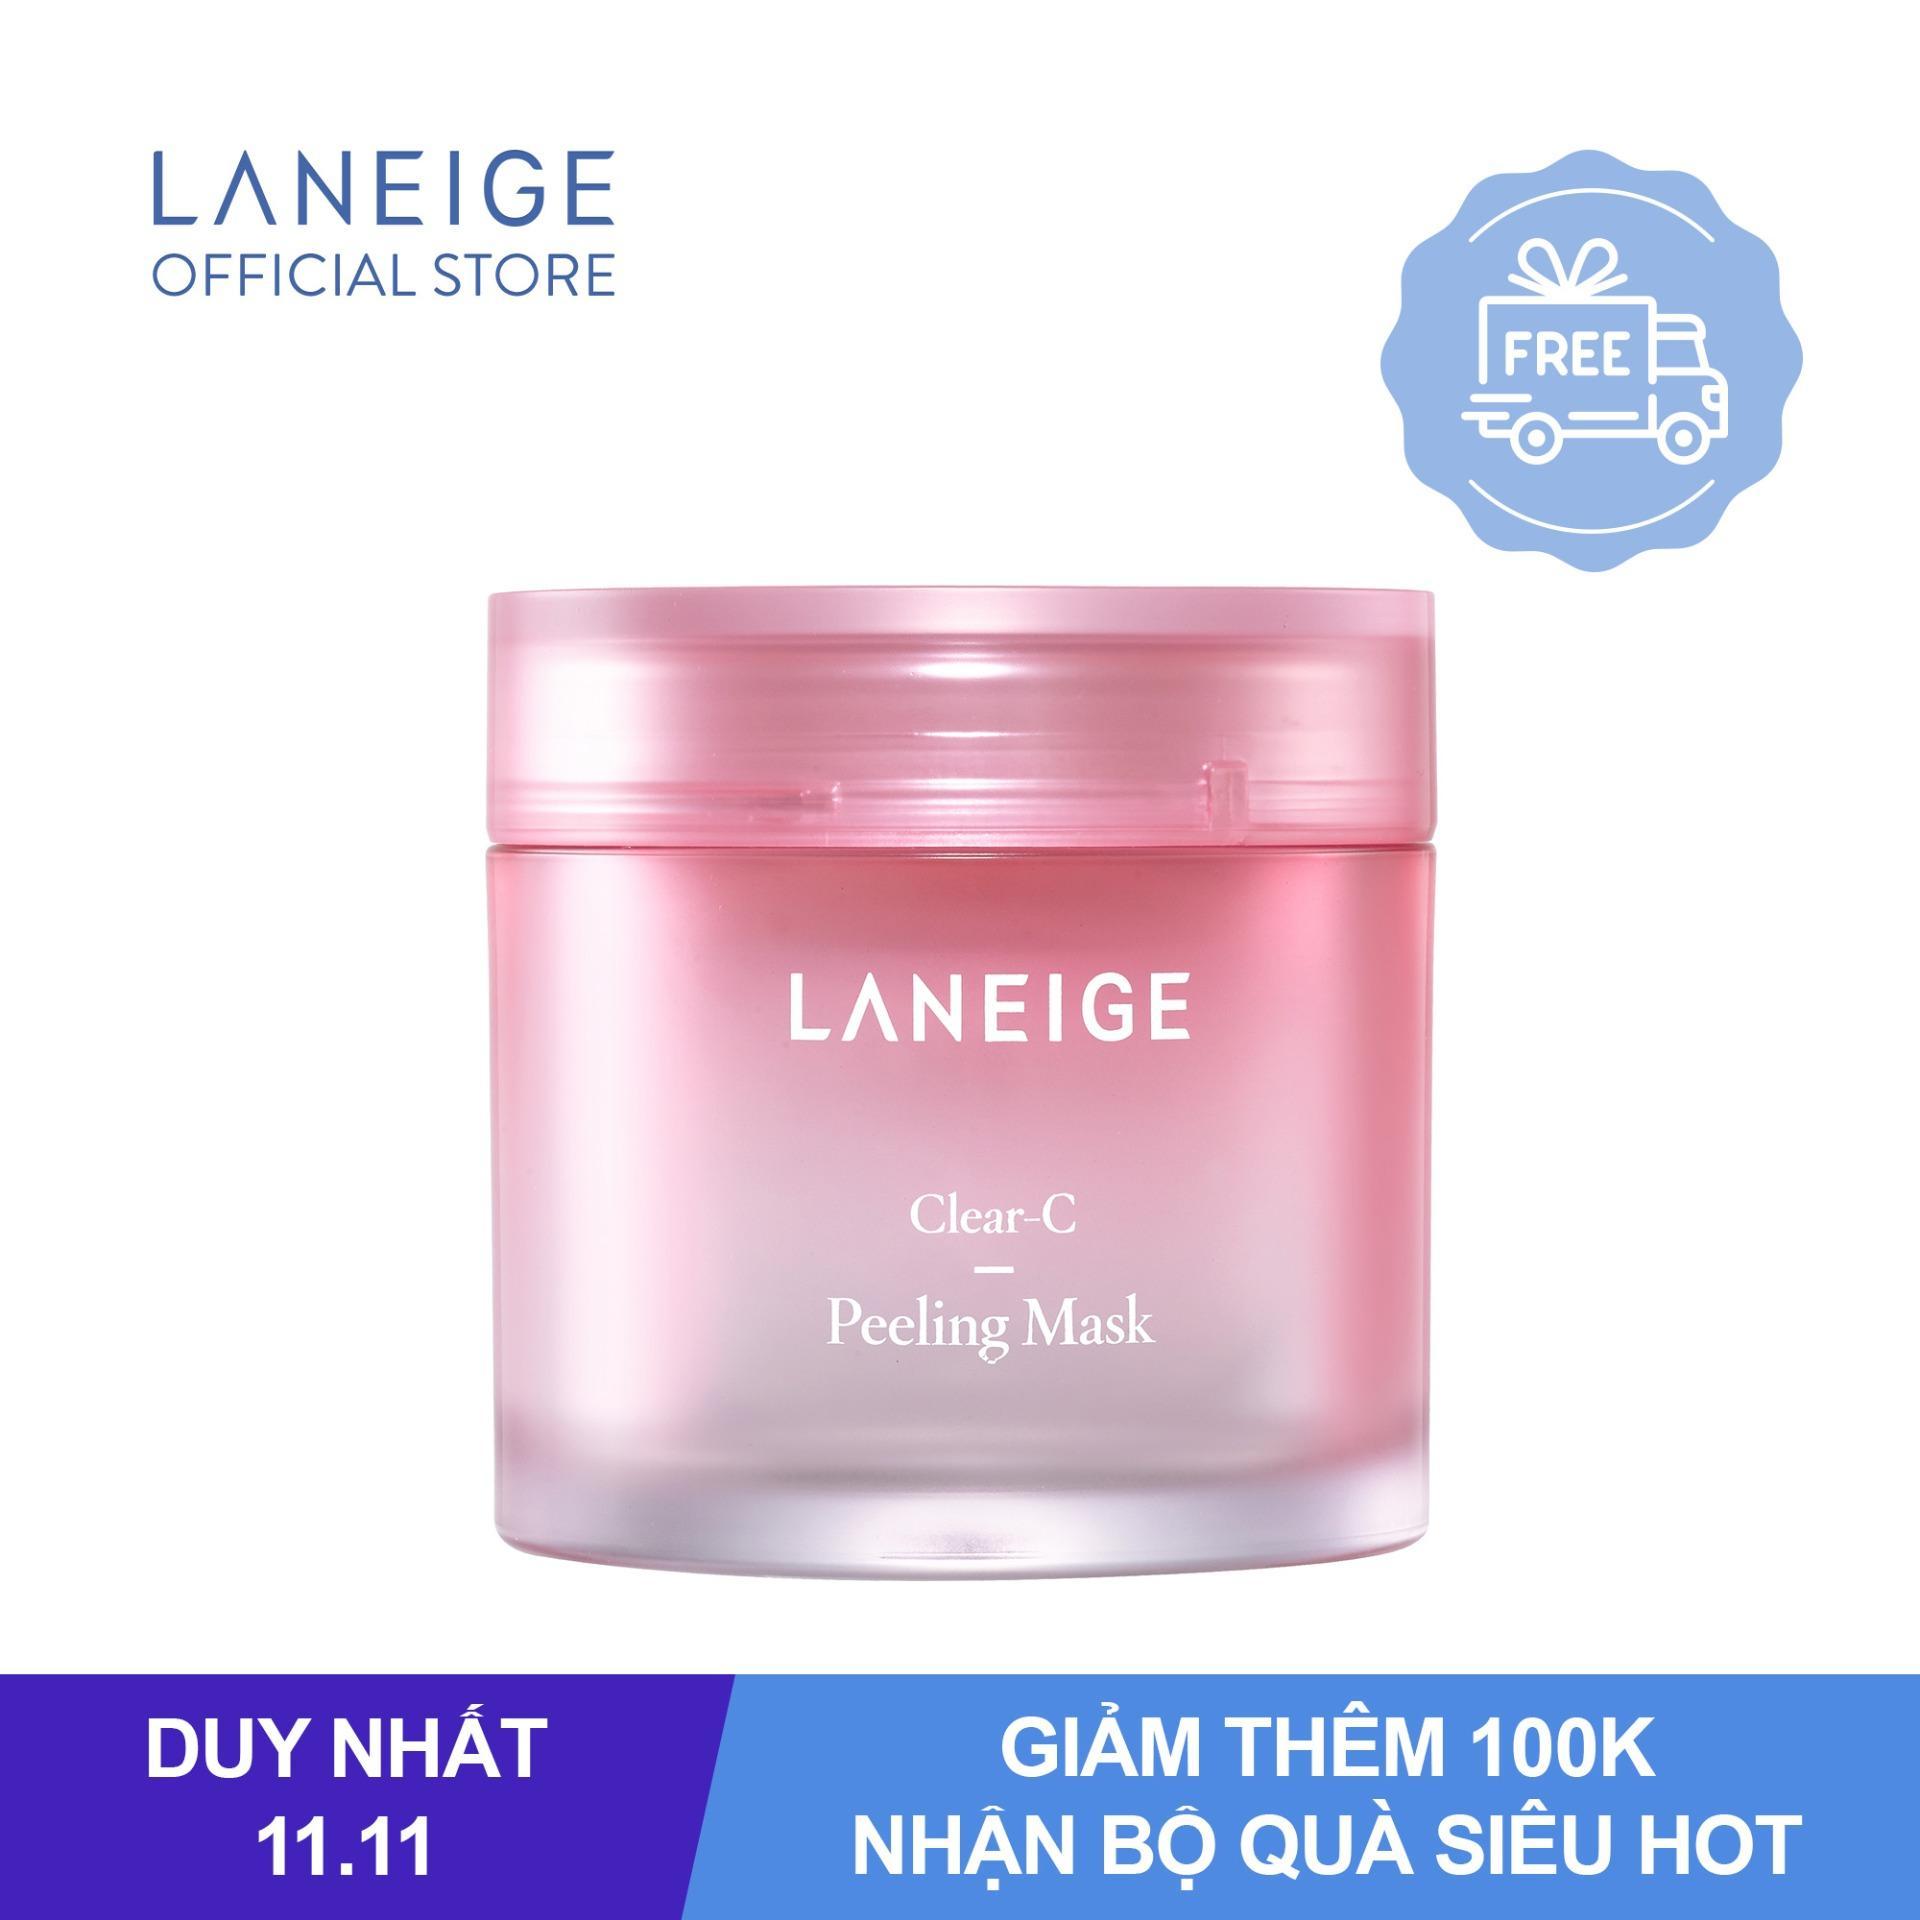 Mặt nạ loại bỏ tế bào chết dịu nhẹ cho da Laneige Clear-C Peeling Mask 70ml